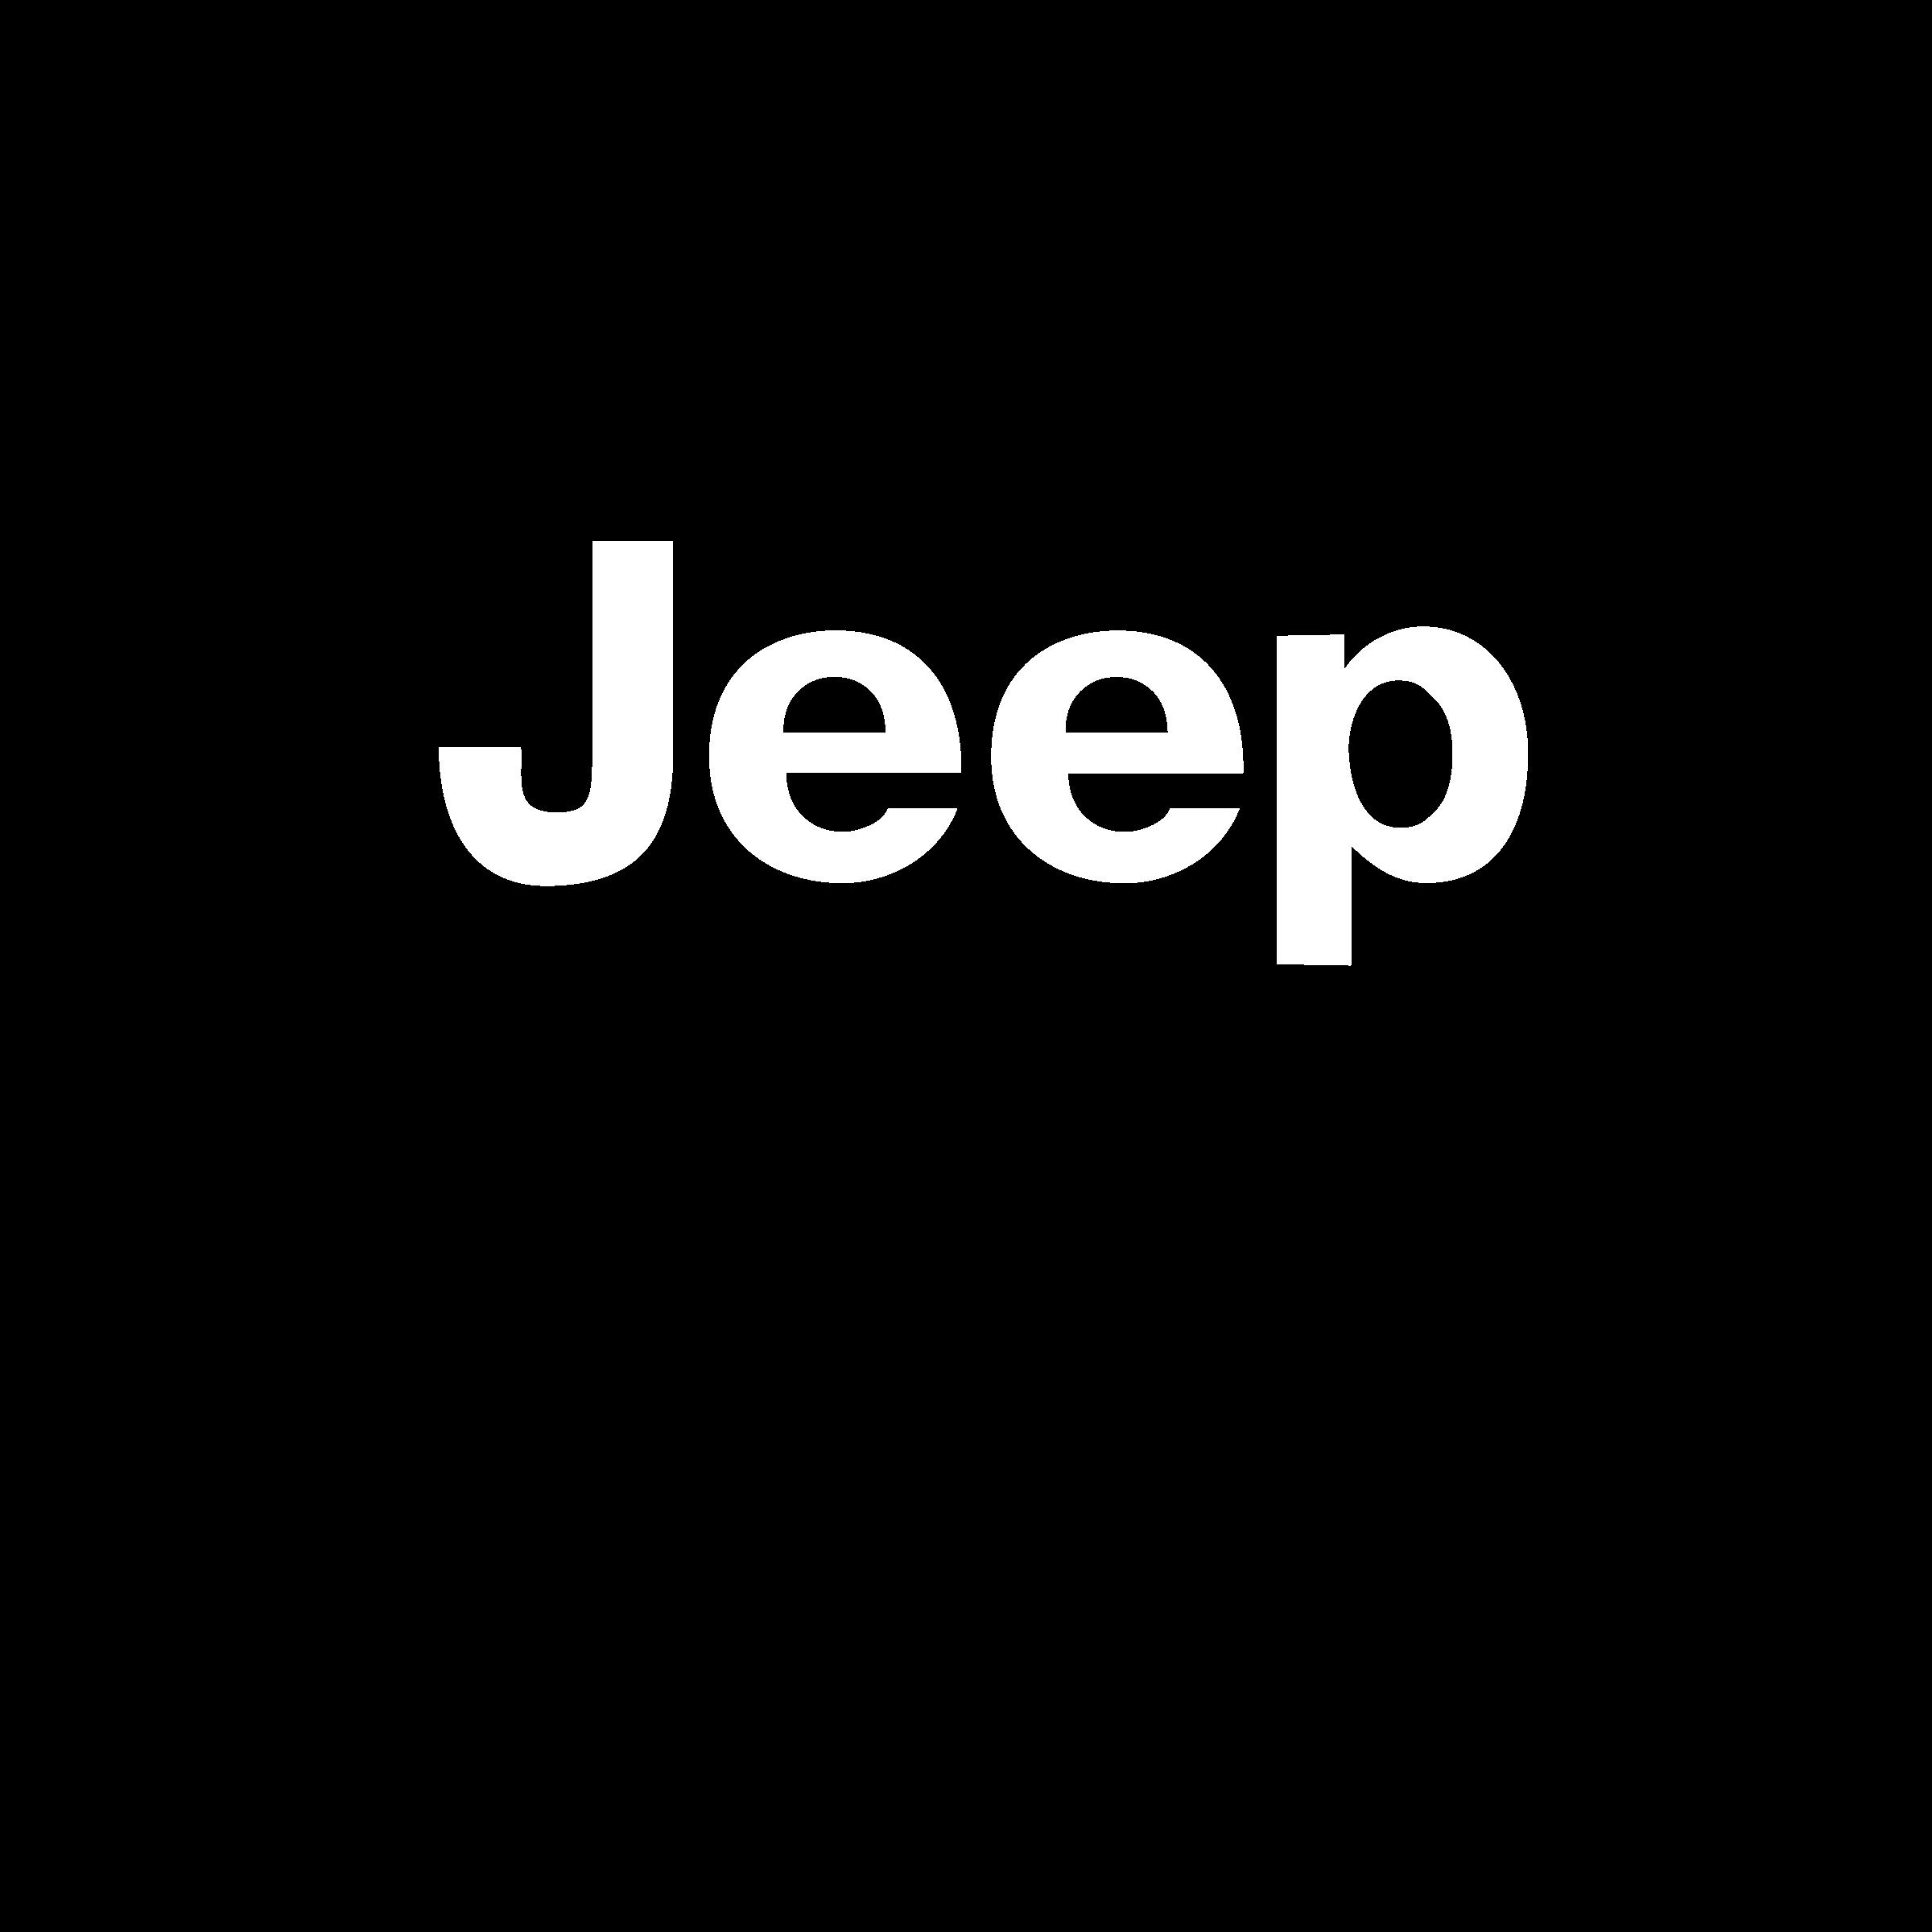 Jeep Logo PNG Transparent & SVG Vector.